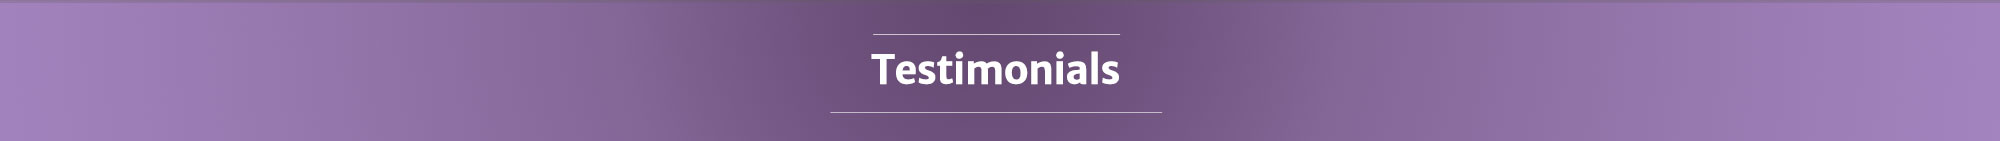 testimonials-header.jpg